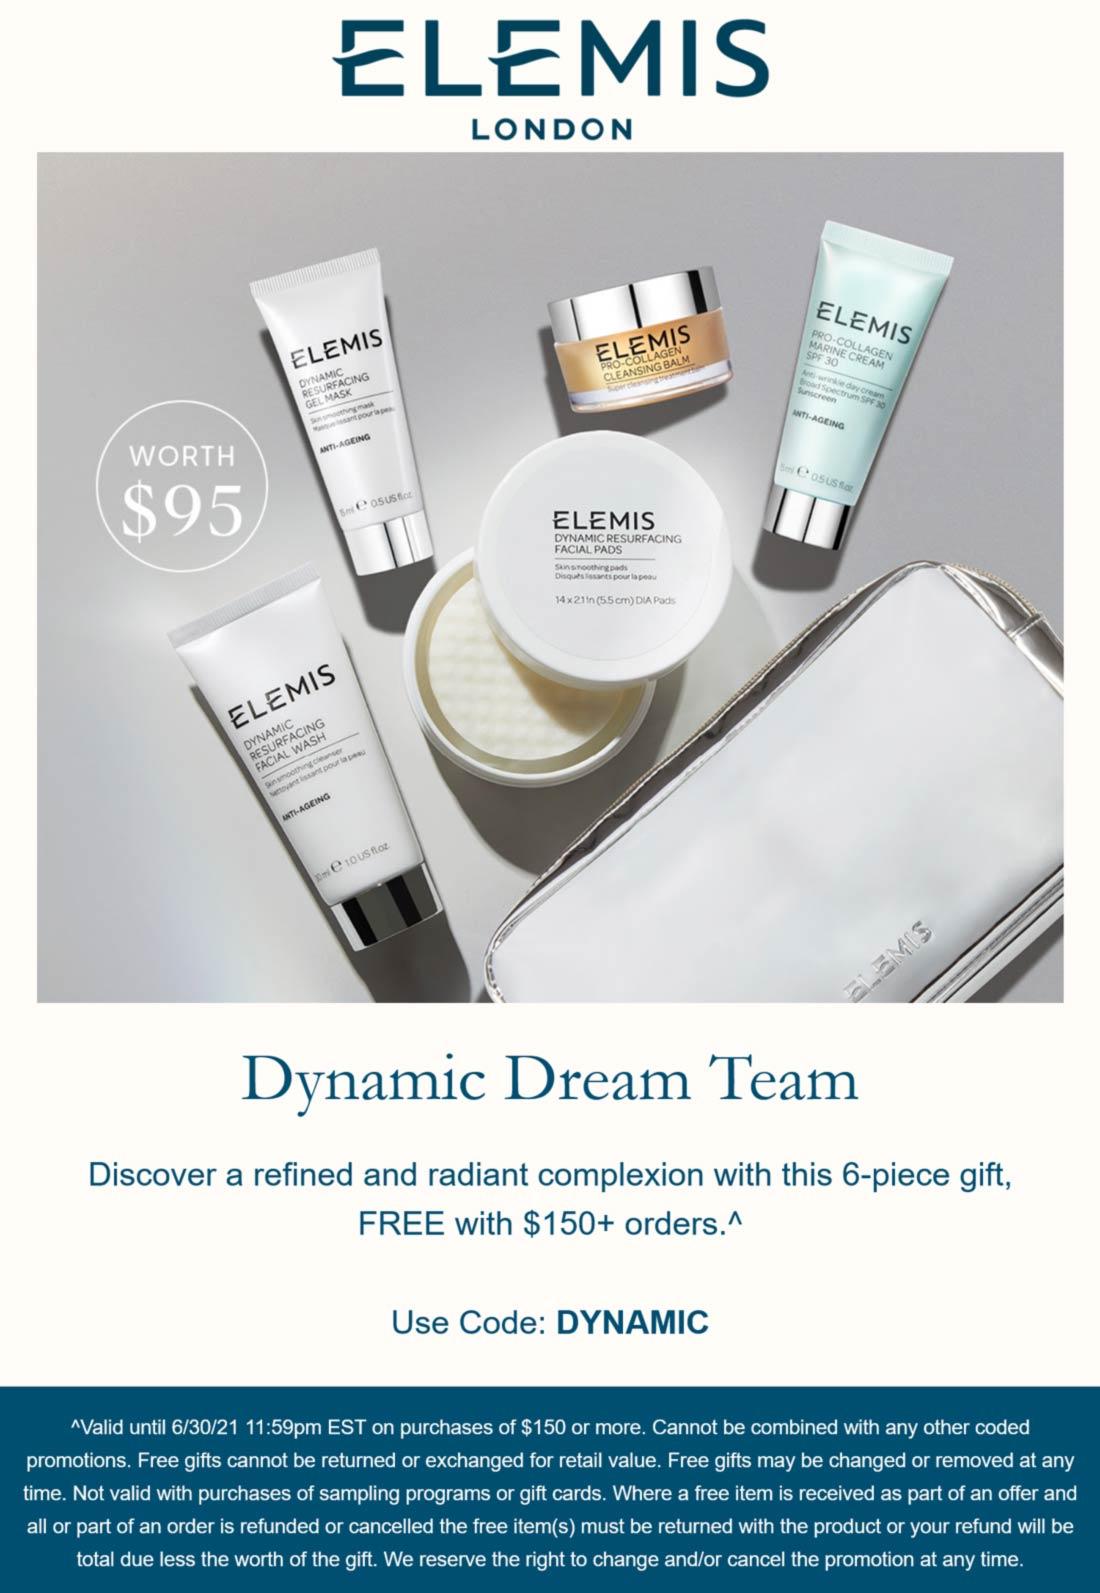 Elemis stores Coupon  Free 6pc $95 set with $150 spent at Elemis via promo code DYNAMIC #elemis